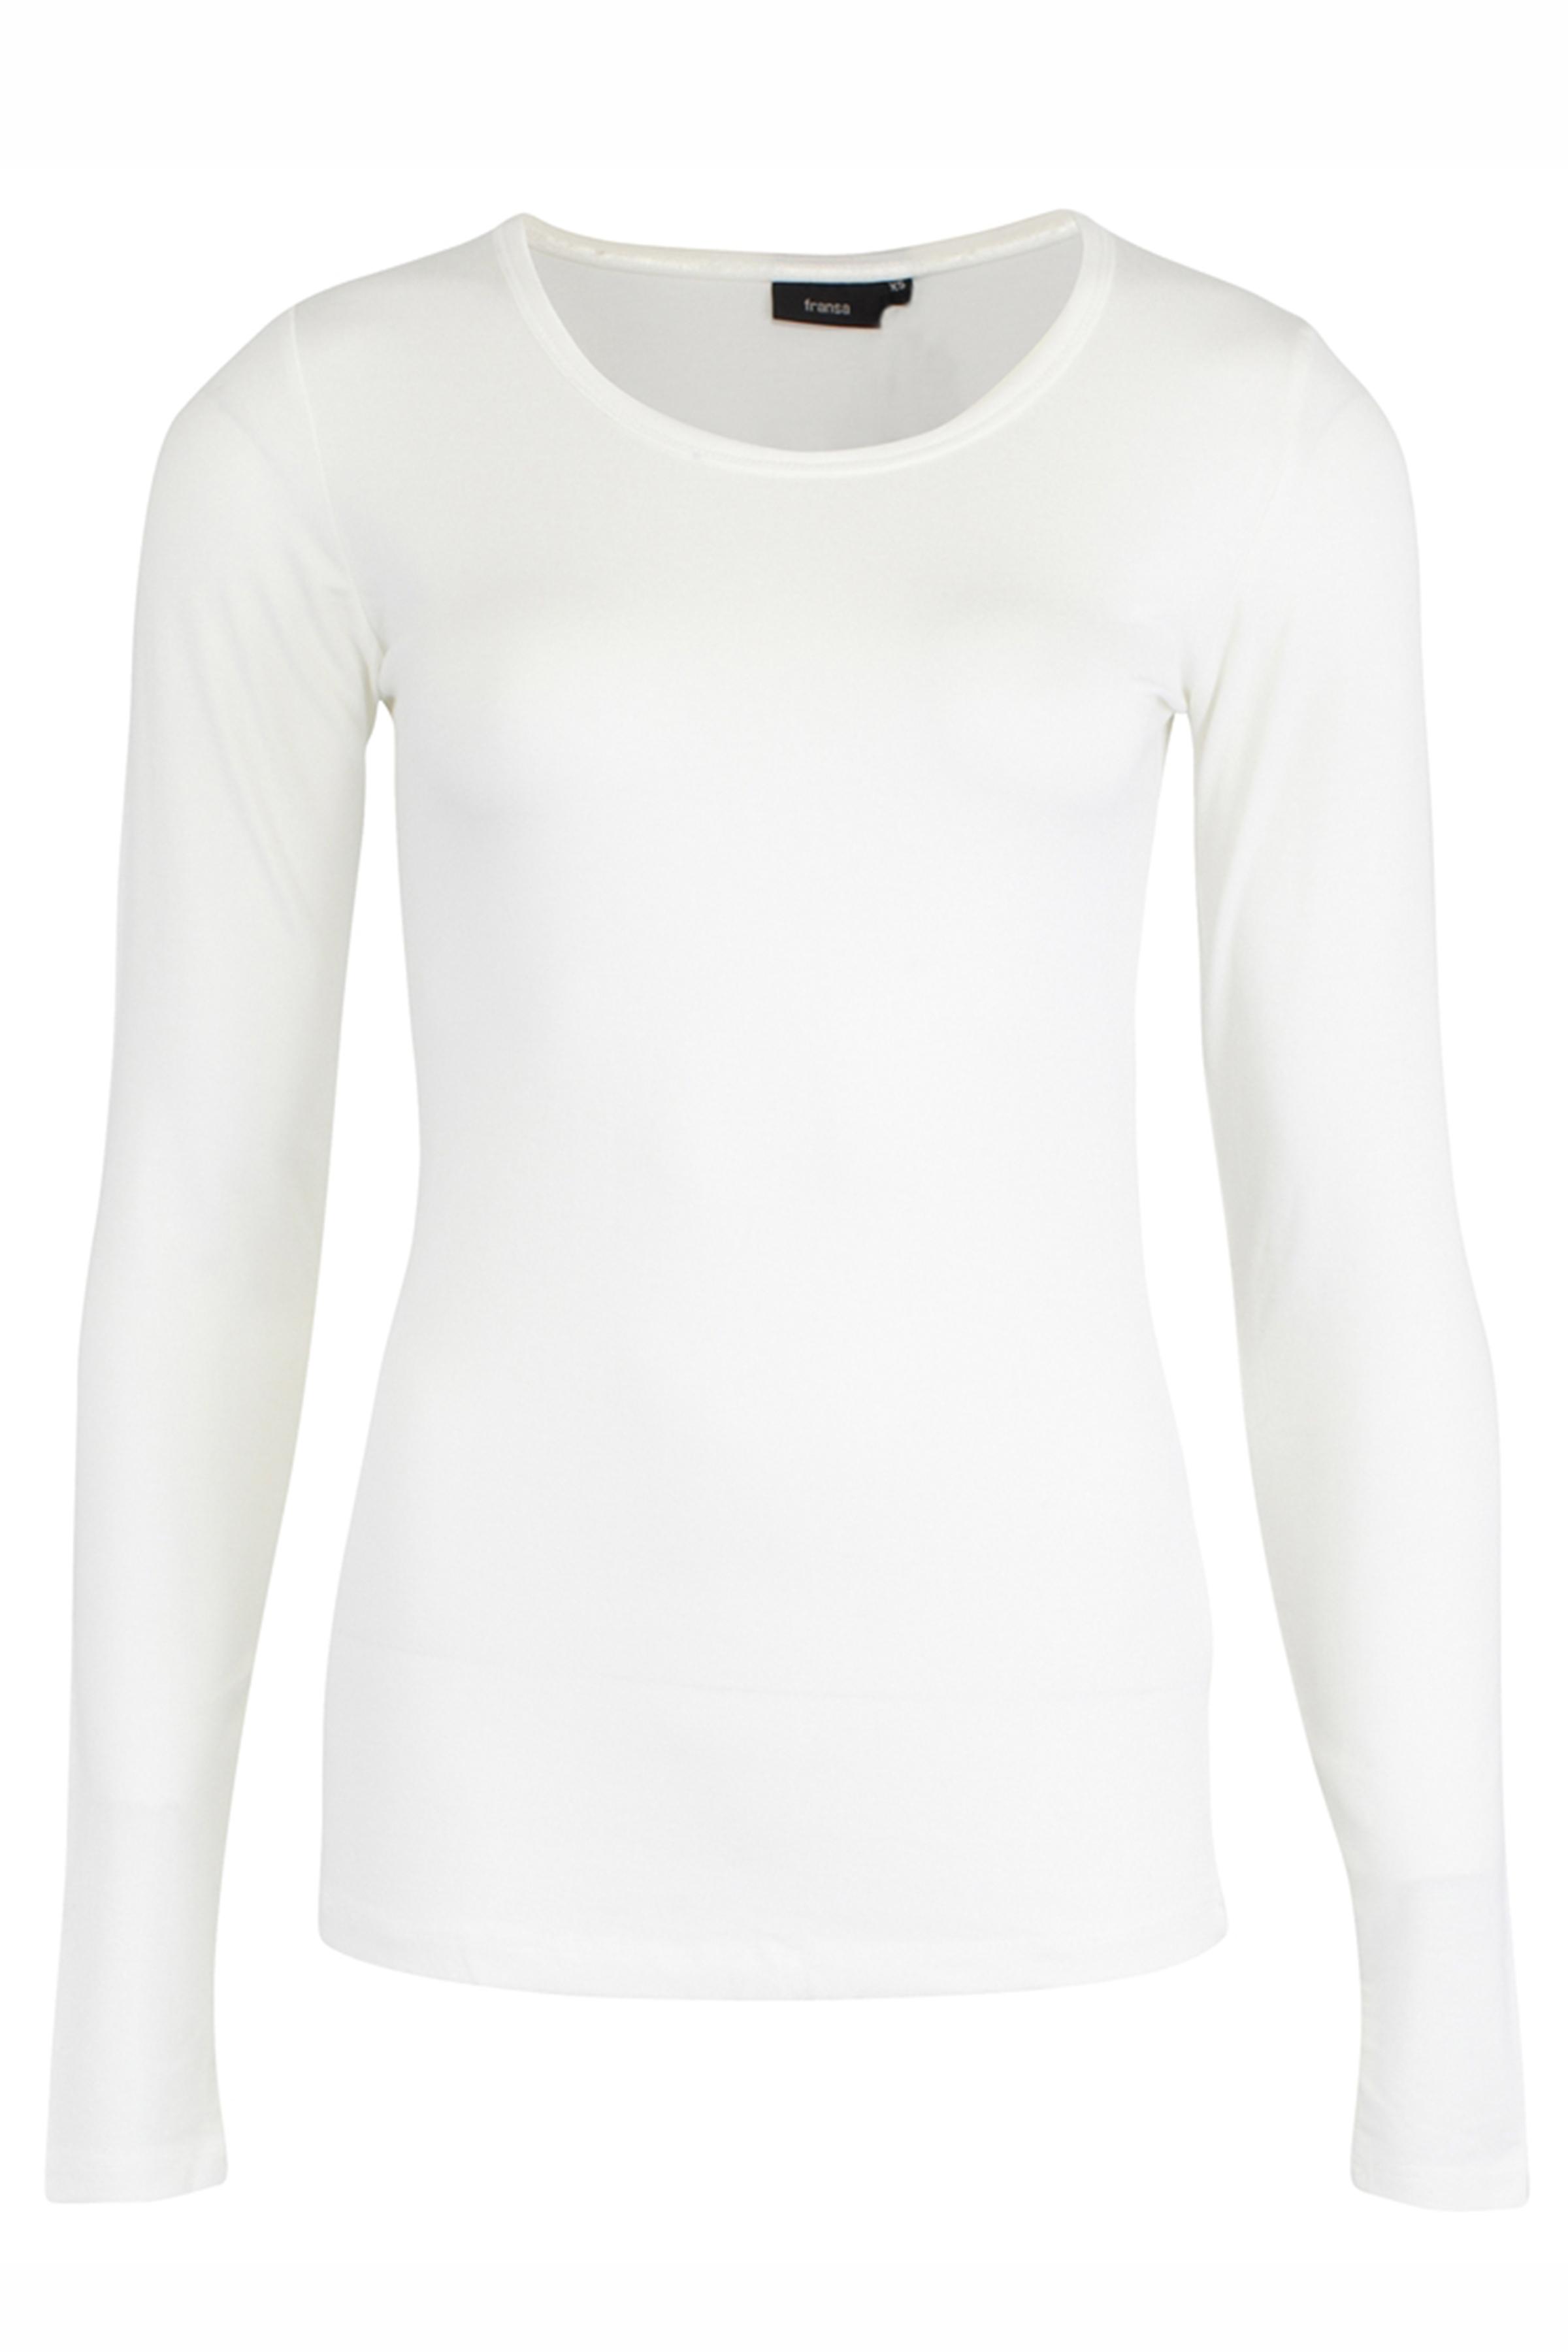 Image of Fransa Dame Langærmet T-shirt - Off-white